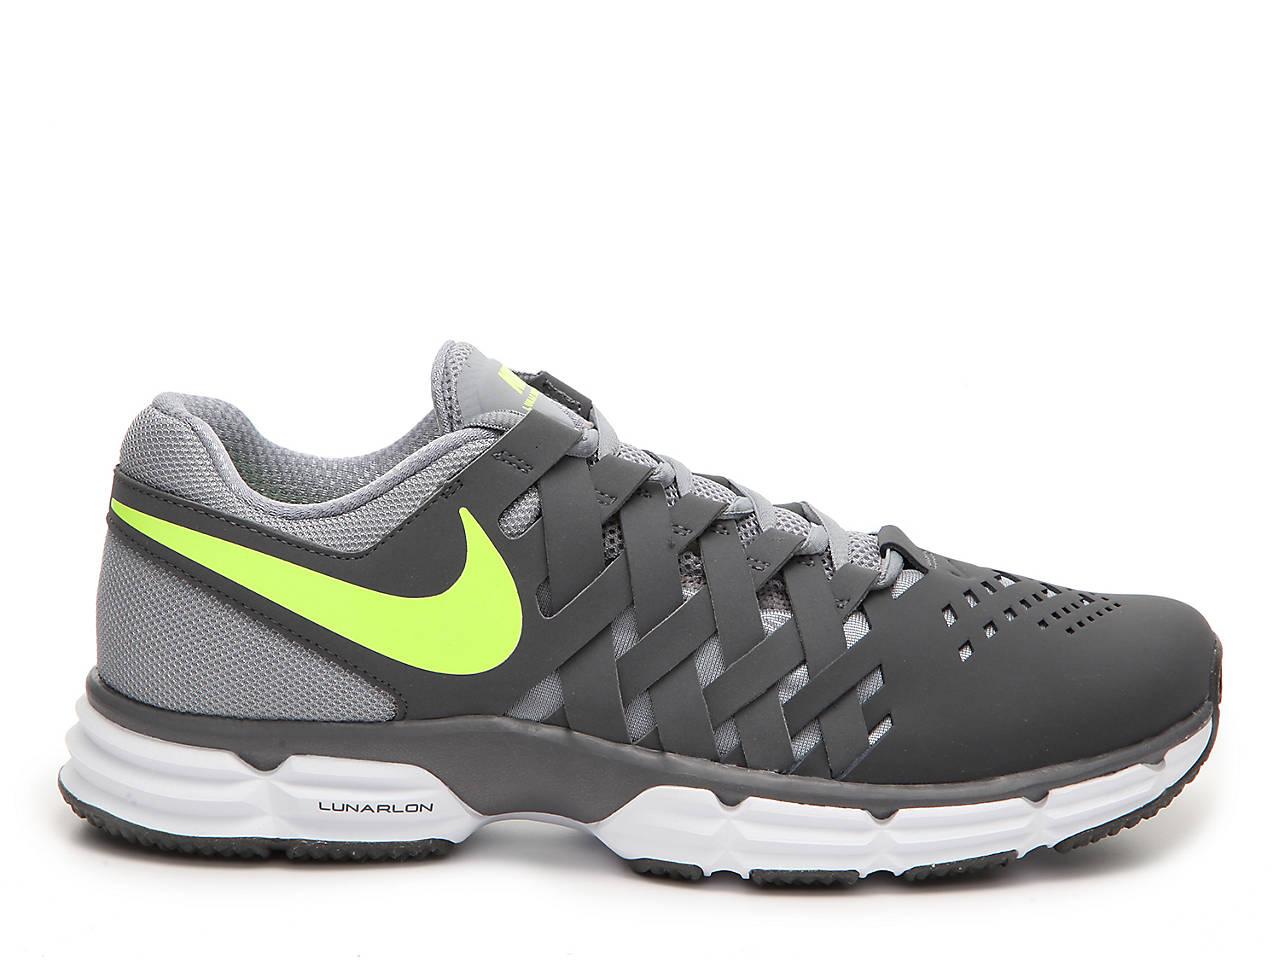 0d1c570905d9d Dsw Mens Nike Running Shoes - Style Guru  Fashion